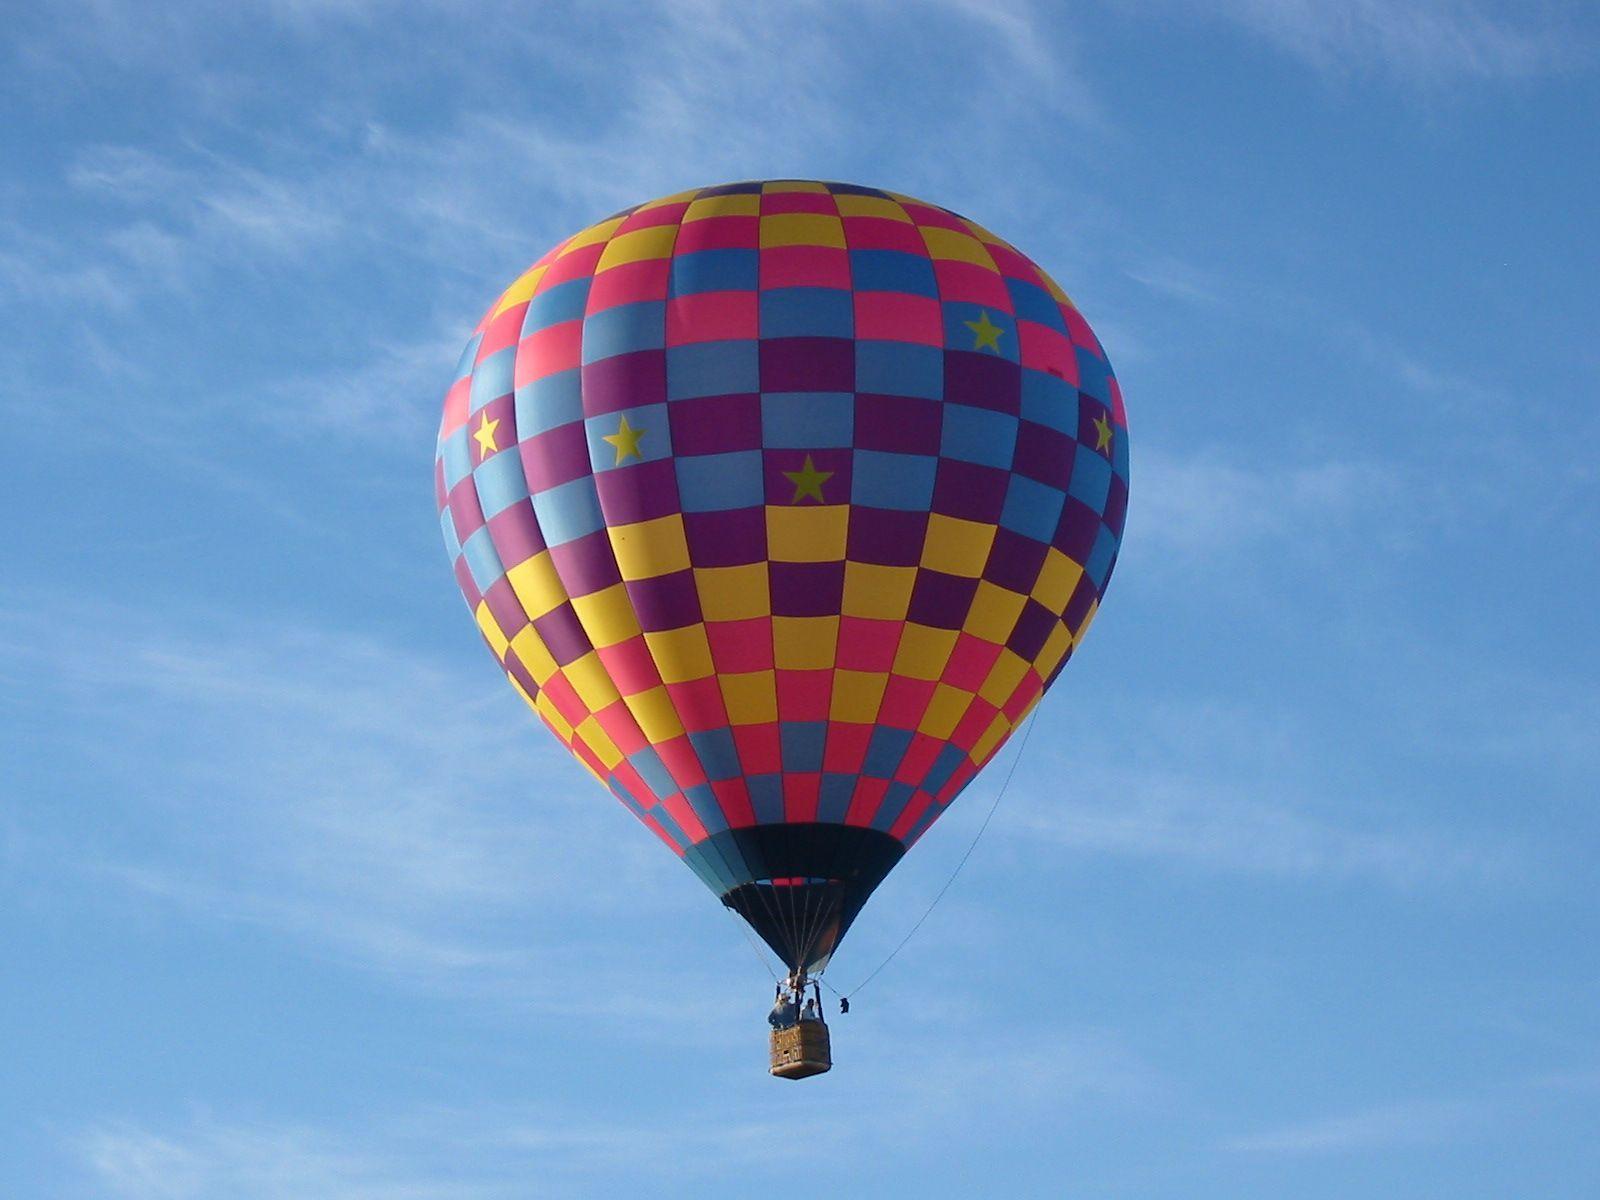 air balloon wikipedia www ideegateau com